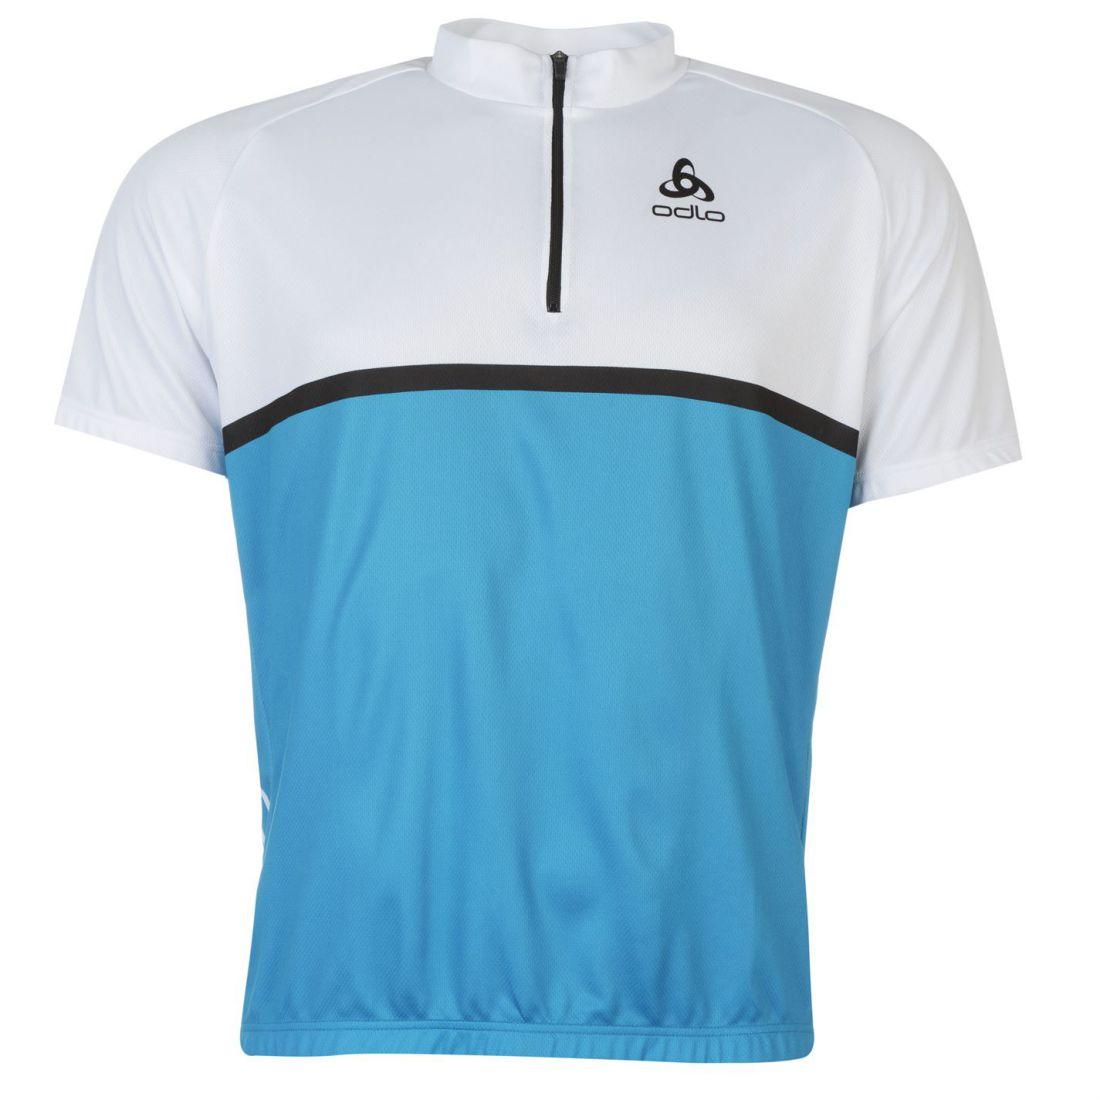 0a234f399 Odlo Mens Cycling Top Short Sleeve Tee Shirt Quarter Zip Elasticated ...